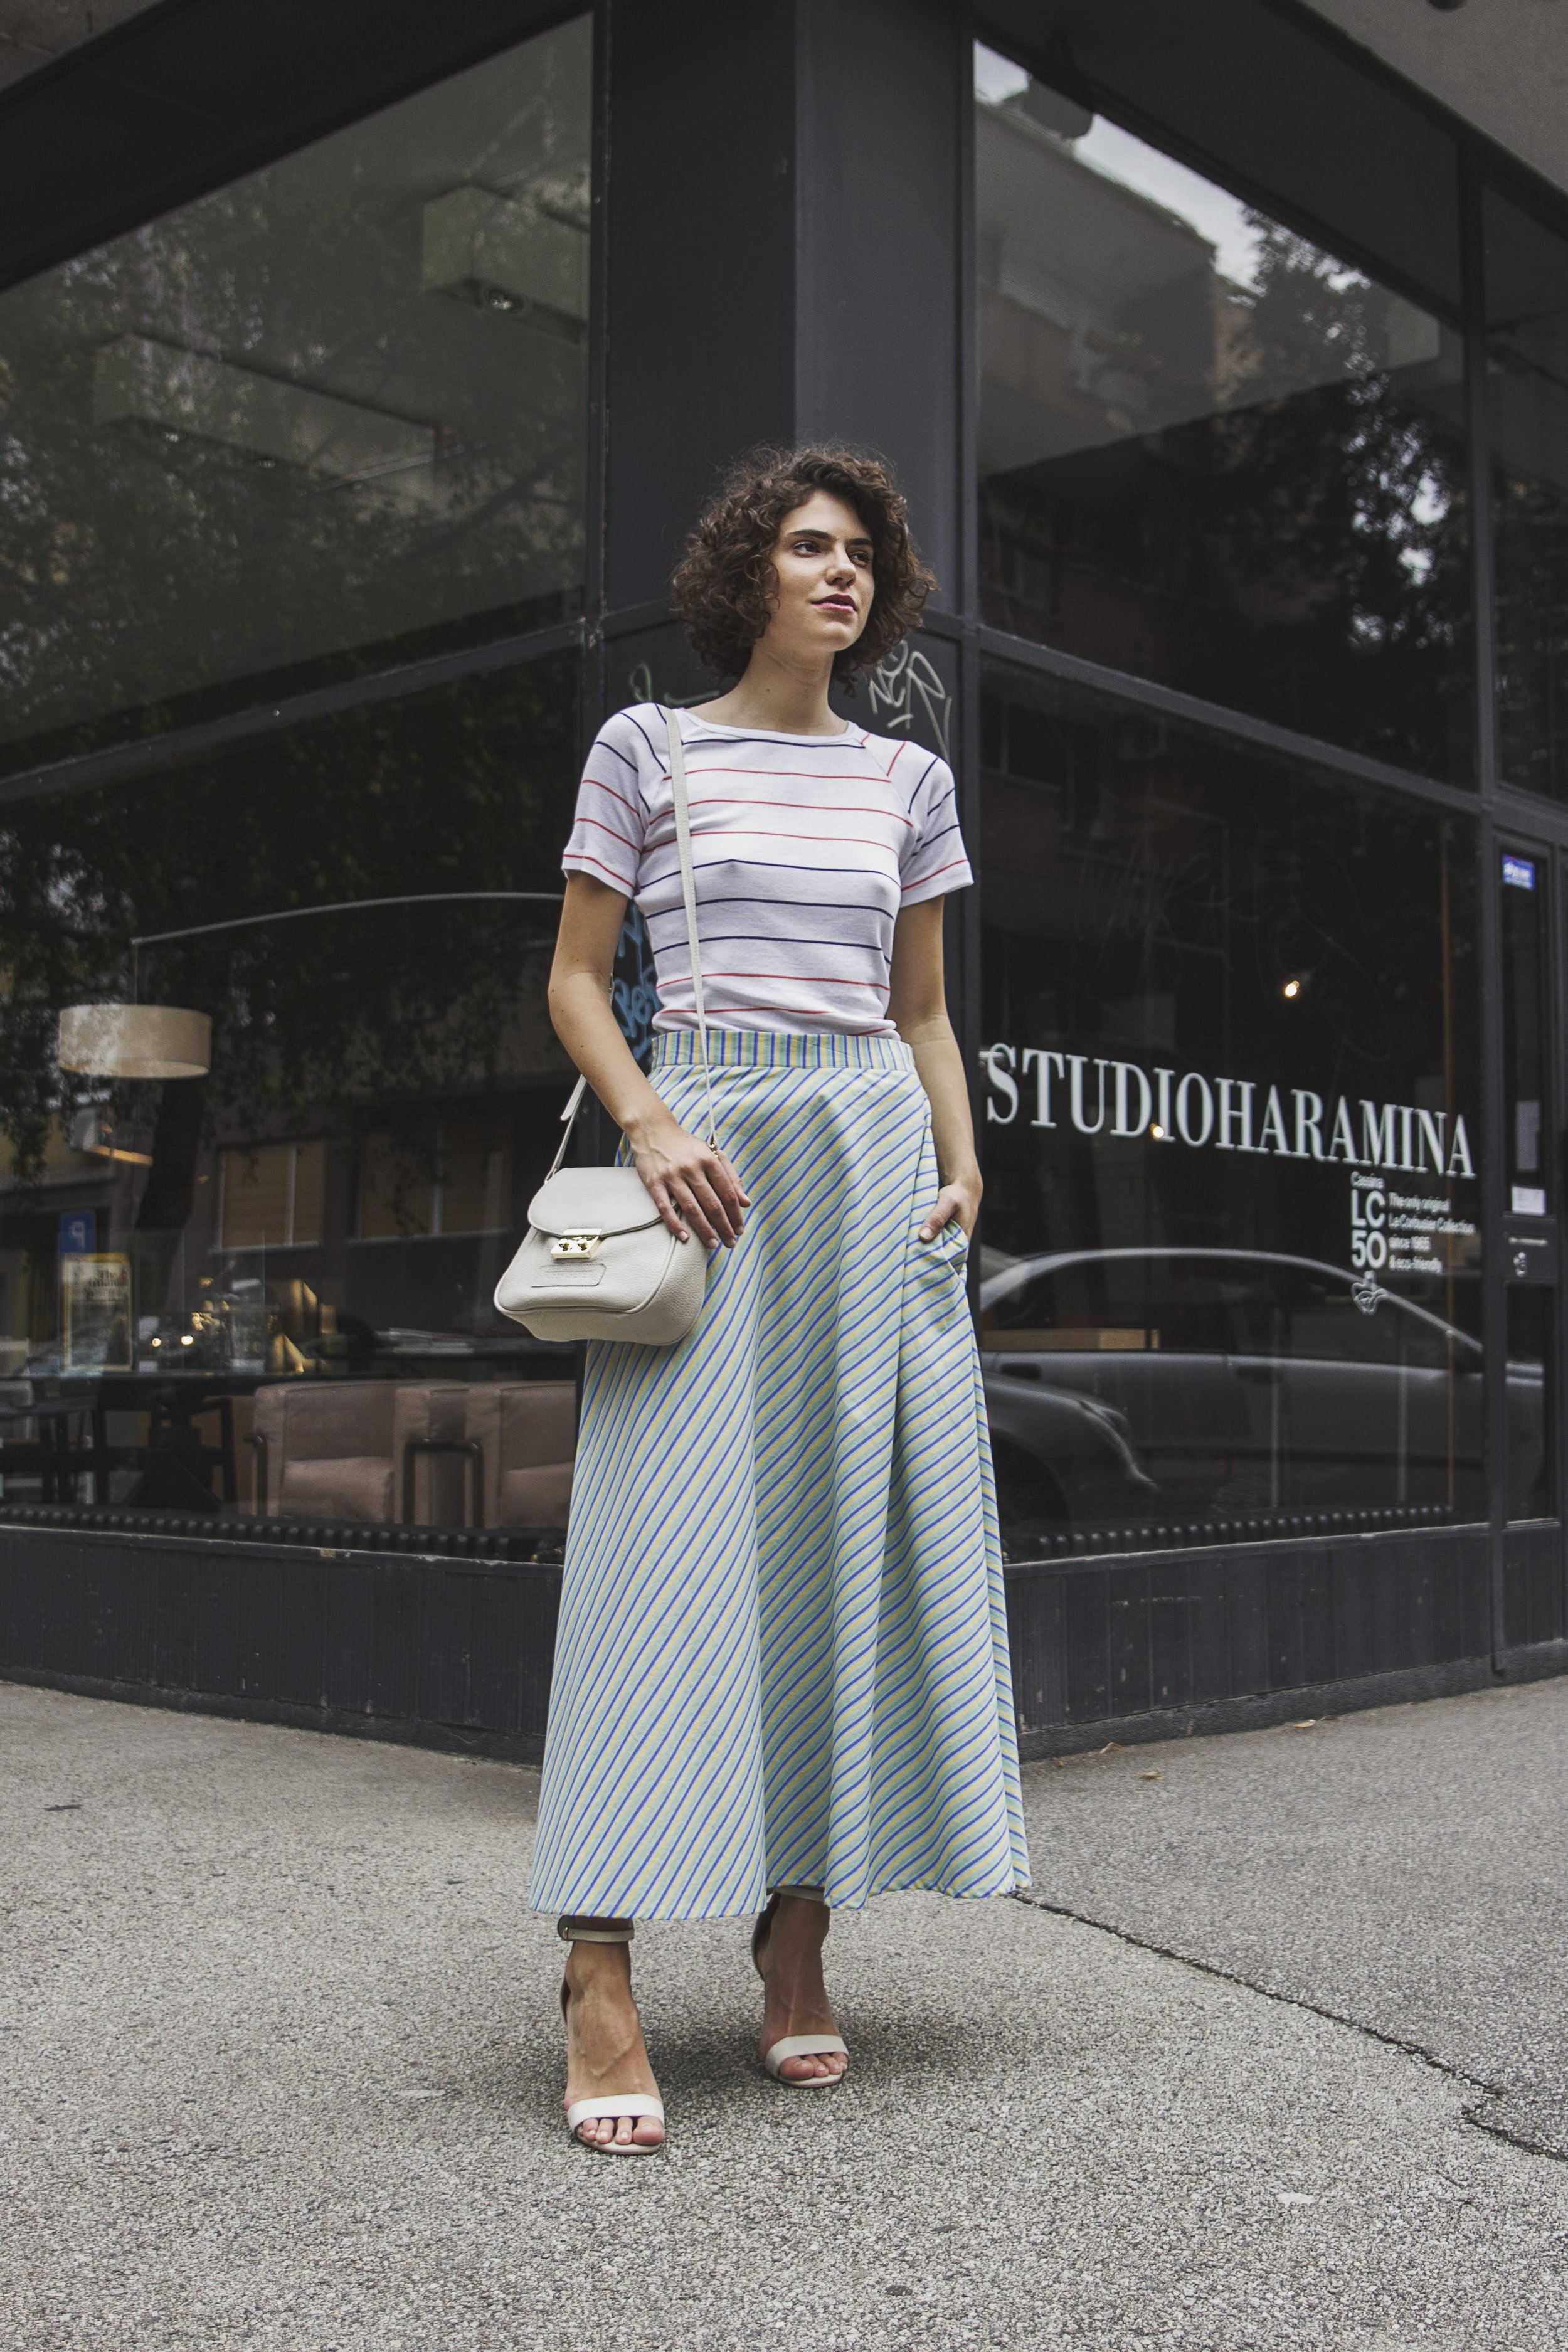 luka-lajic-fashion-photography-robert-sever-dizajner-croatian (8).jpg